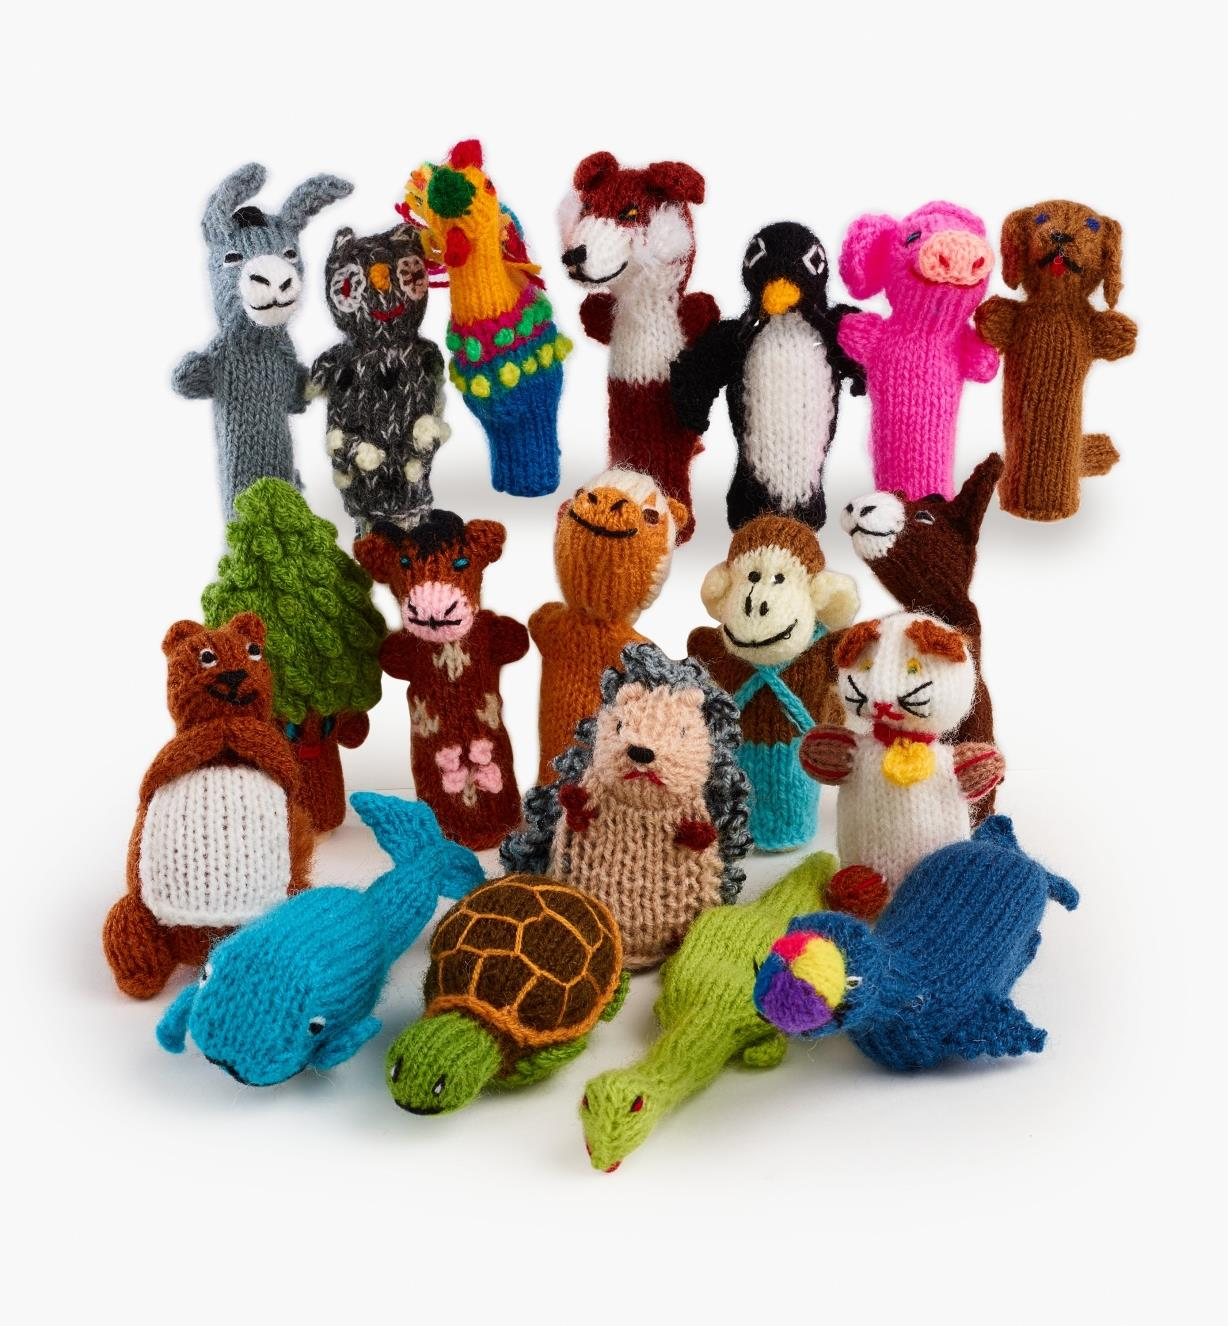 Elephant Crochet Patterns: Eyeglass Holder, Potholder, Panhandler ... | 1326x1229